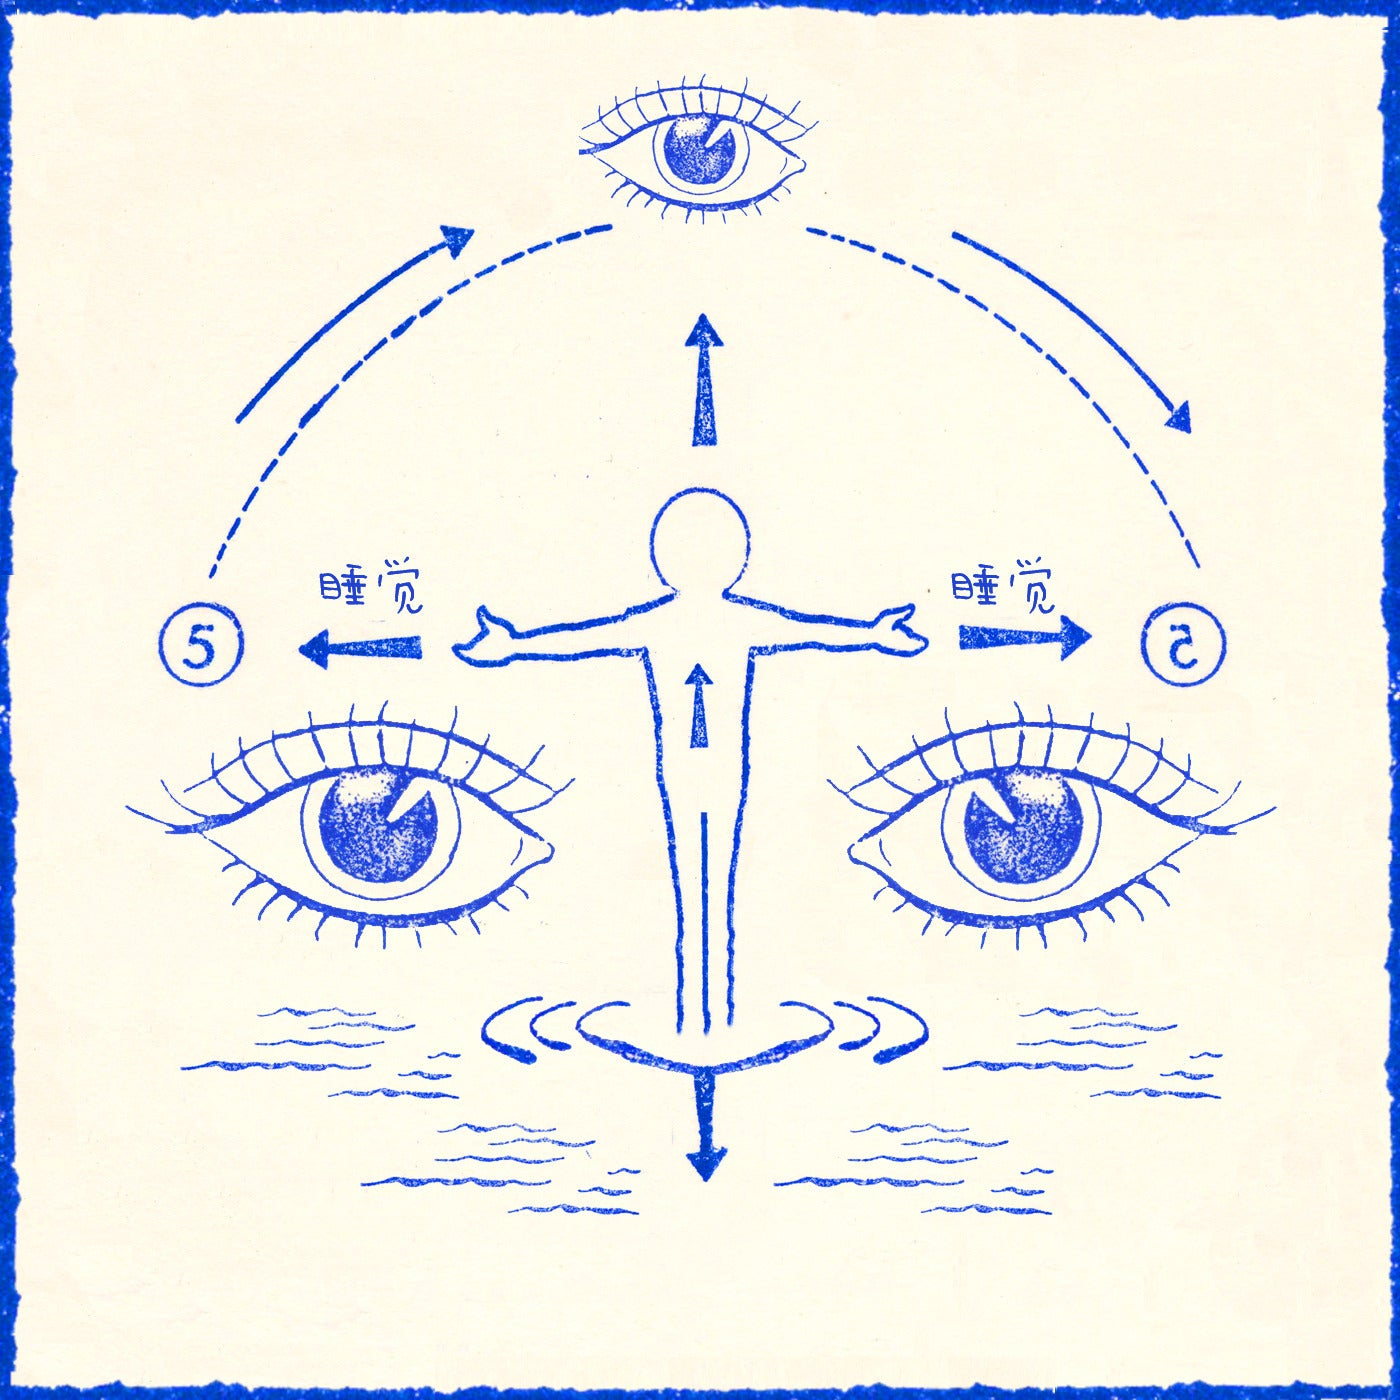 Apnea Instructions 04 (Johannes Albert Remix)